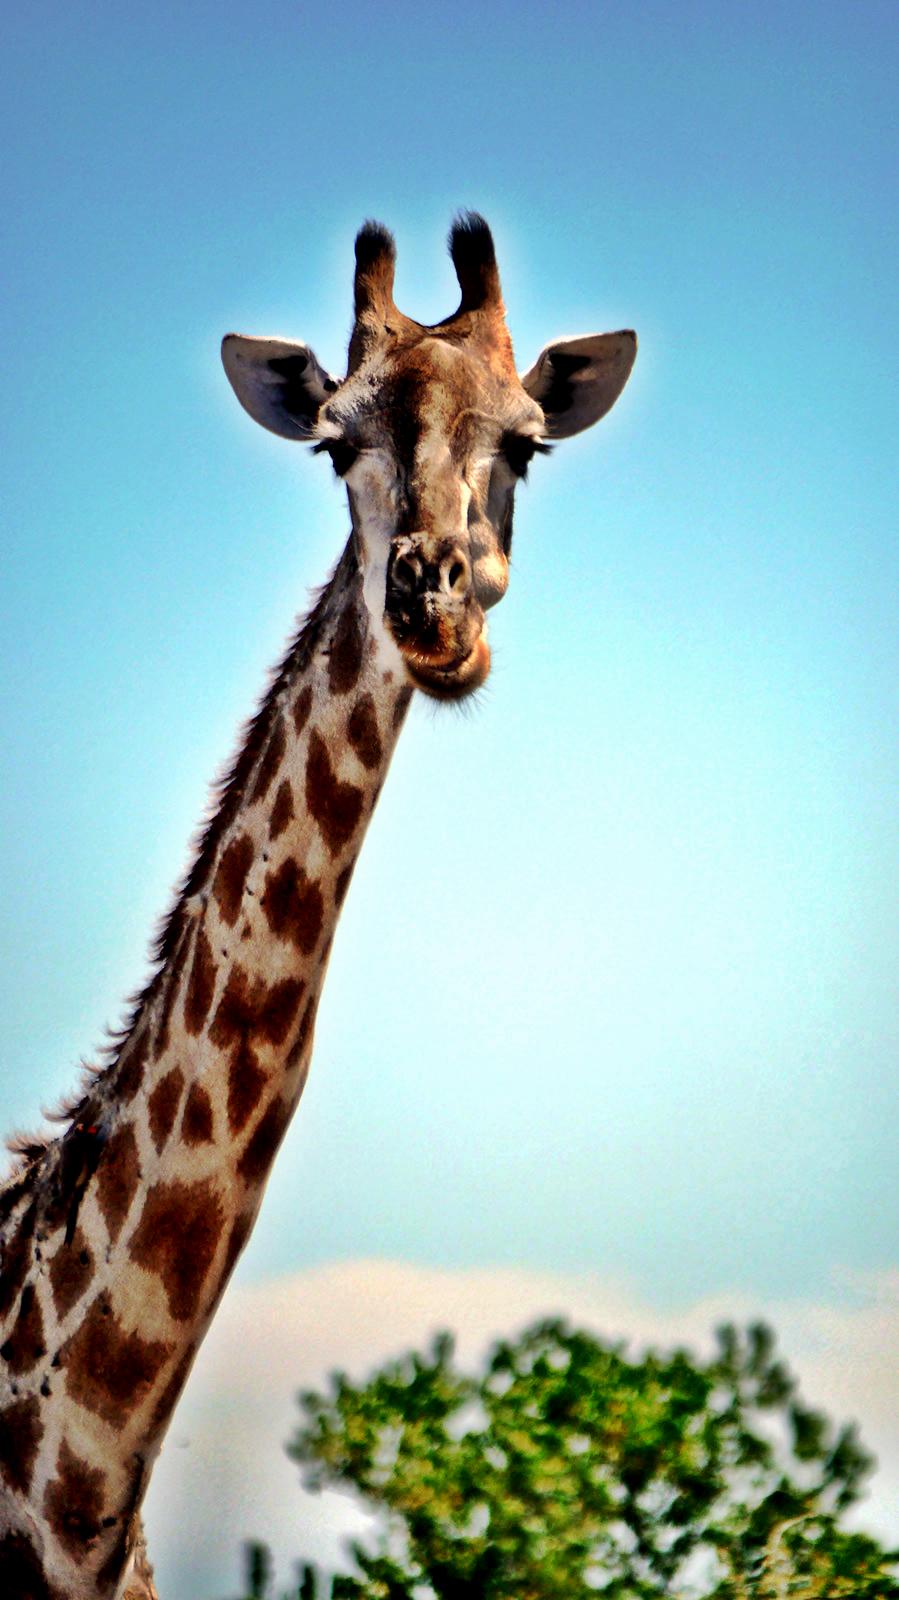 Safari In Va >> Visions of Botswana: On Safari Along Africa's Chobe River [Gallery] - Vagabondish